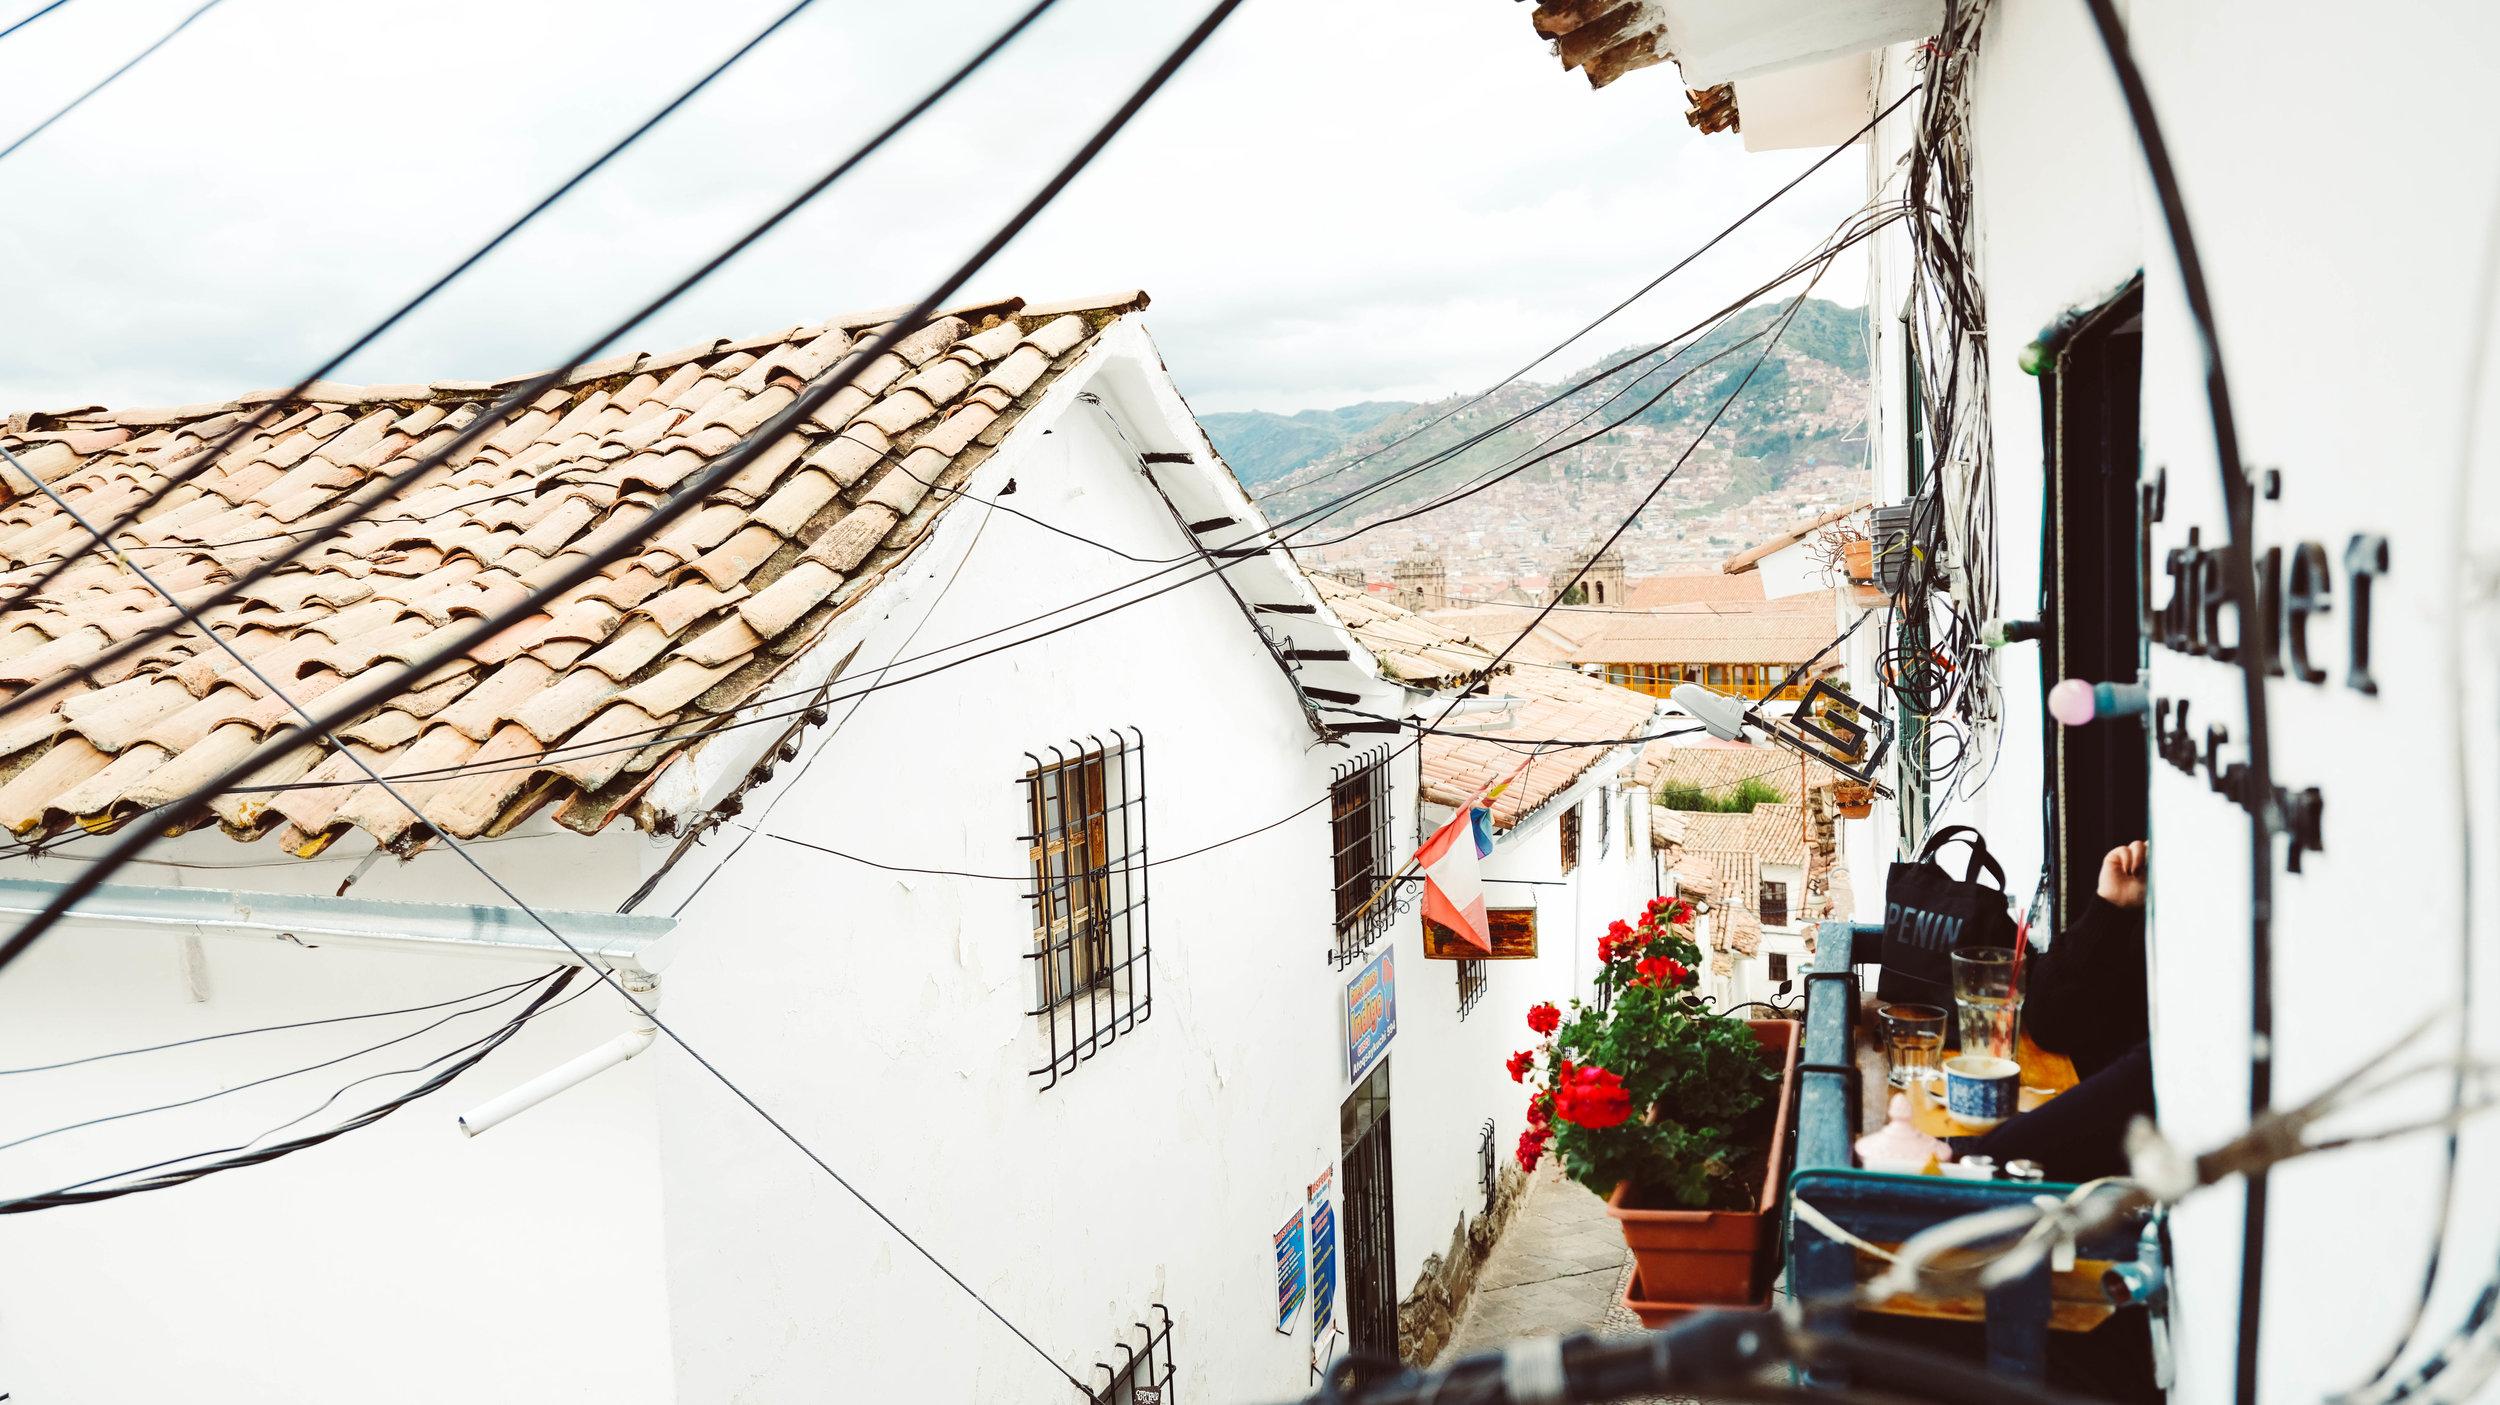 San Blas Neighborhood Cuzco